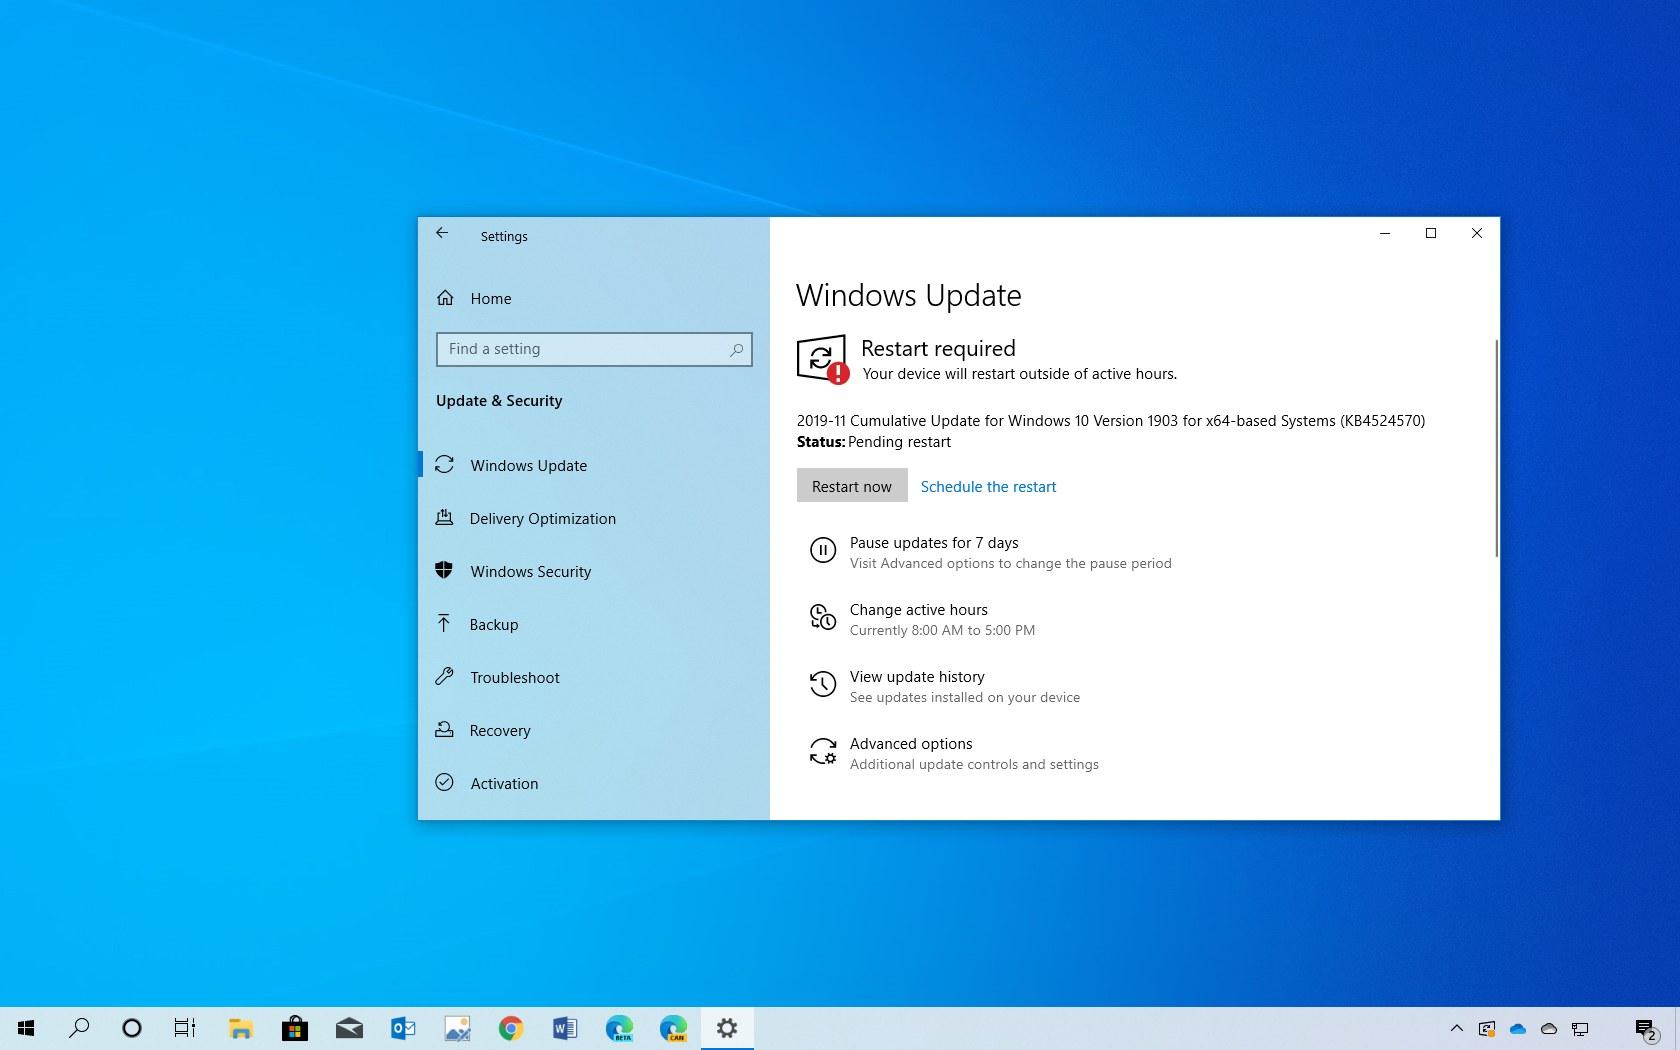 KB4524570 update for Windows 10 download